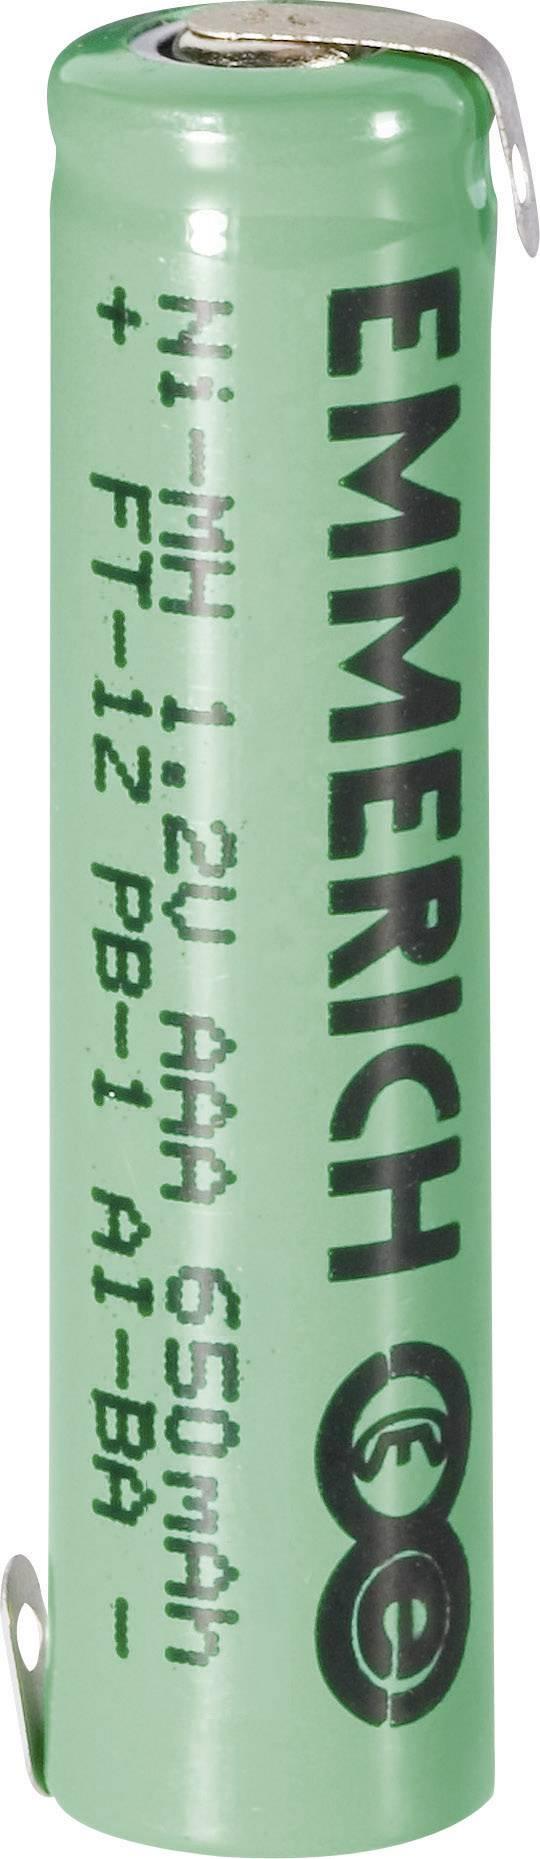 Špeciálny akumulátor Emmerich Micro ZLF, micro (AAA), NiMH, 1.2 V, 650 mAh